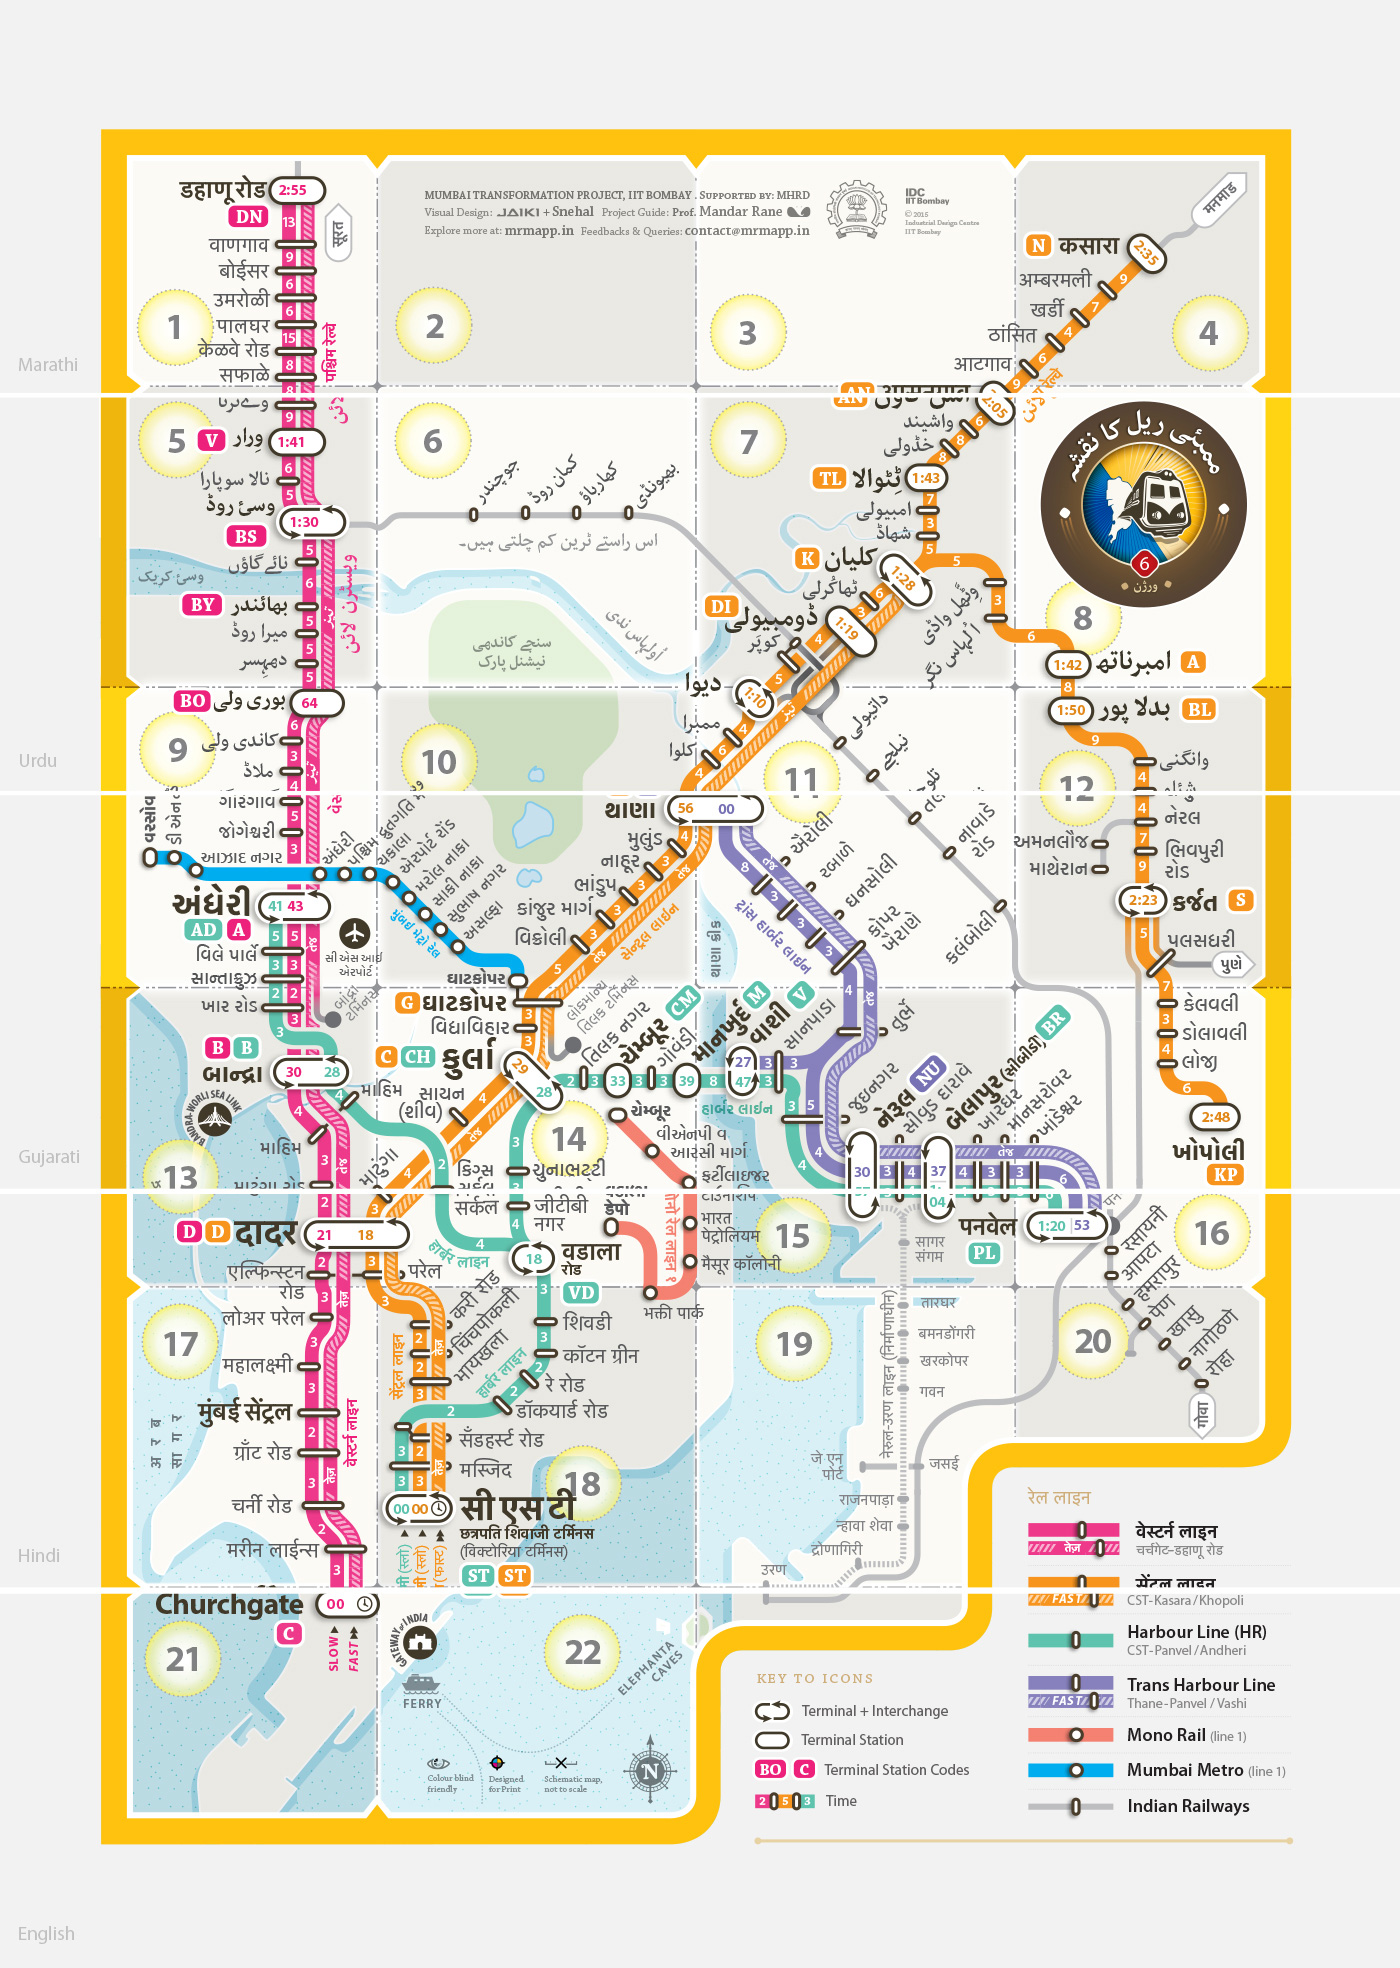 Mumbai Rail Map Design Degree Show - World map image in marathi